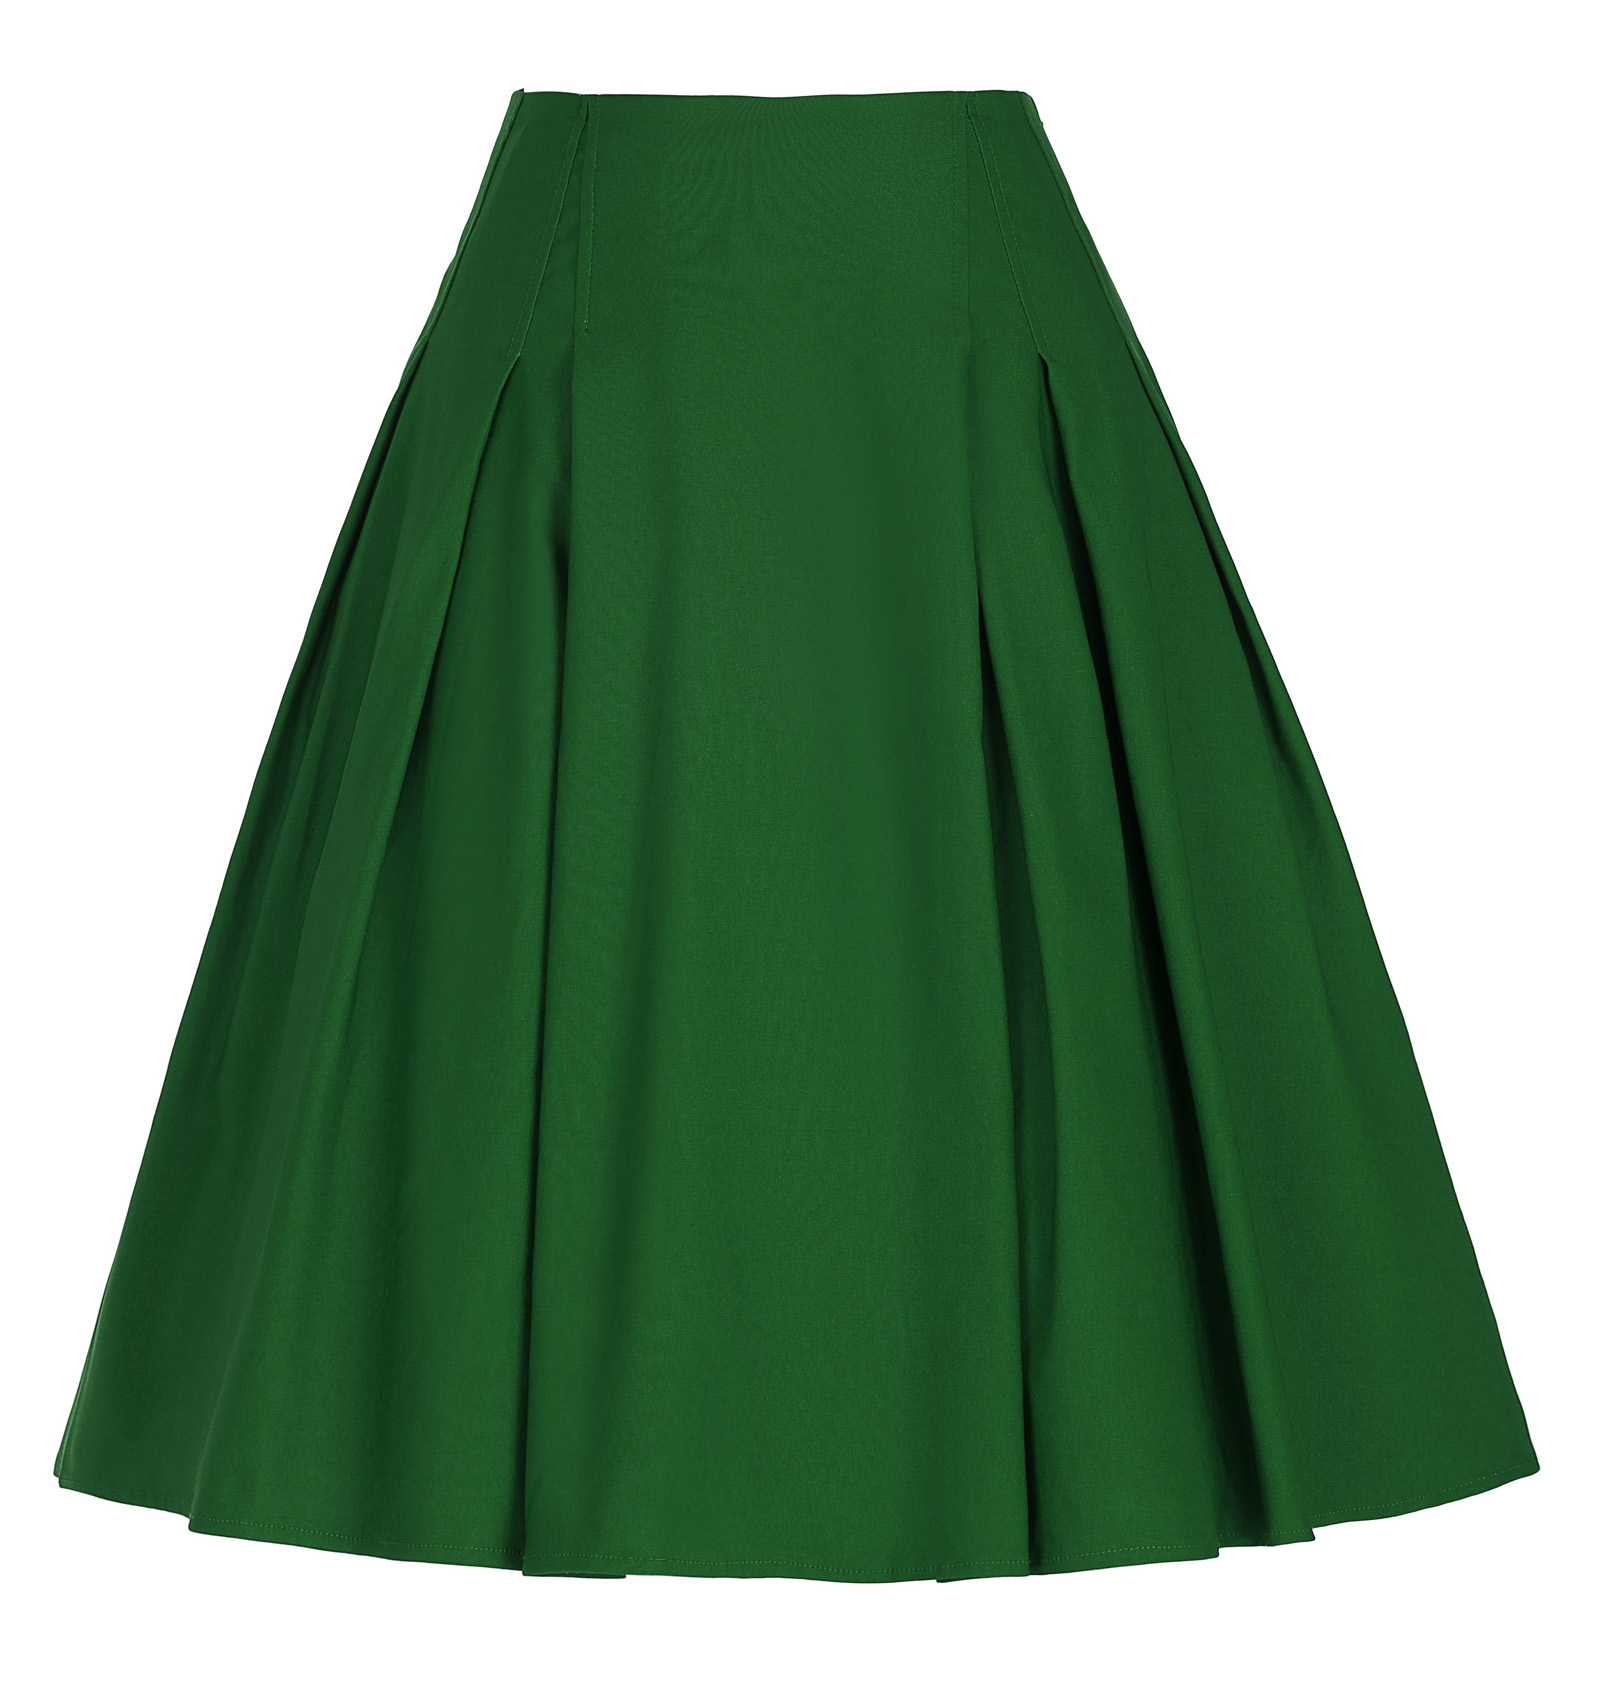 Vintage Retro skirt Women Black red green blue skirts knee High Stretchy A-Line Skirt punk rock gypsy skirt falda plisada